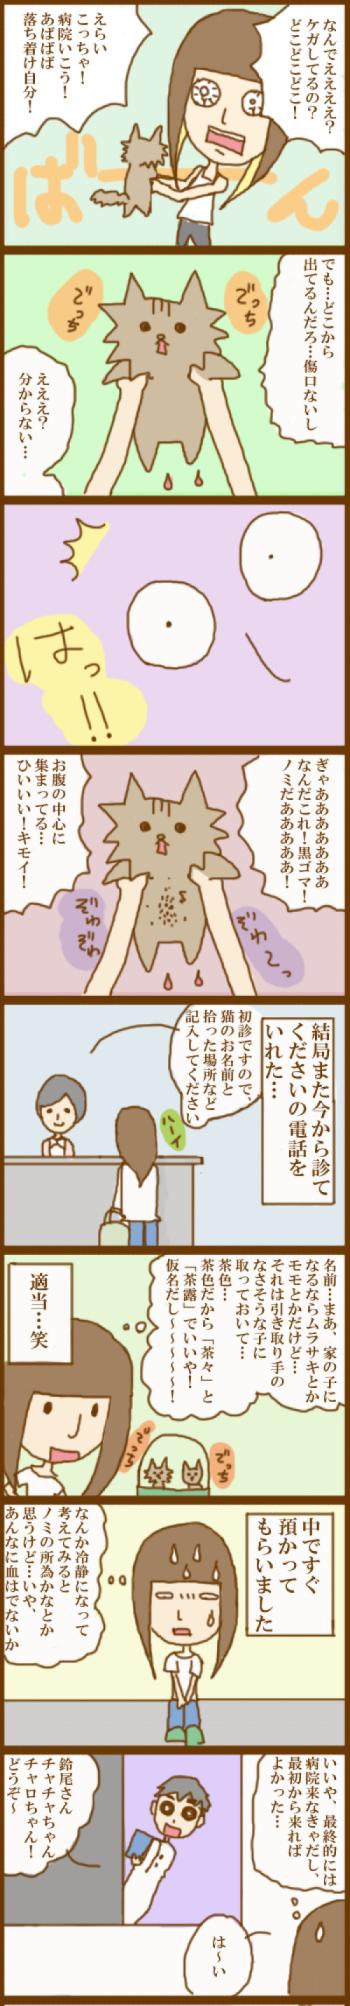 f:id:suzuokayu:20201120115751j:plain